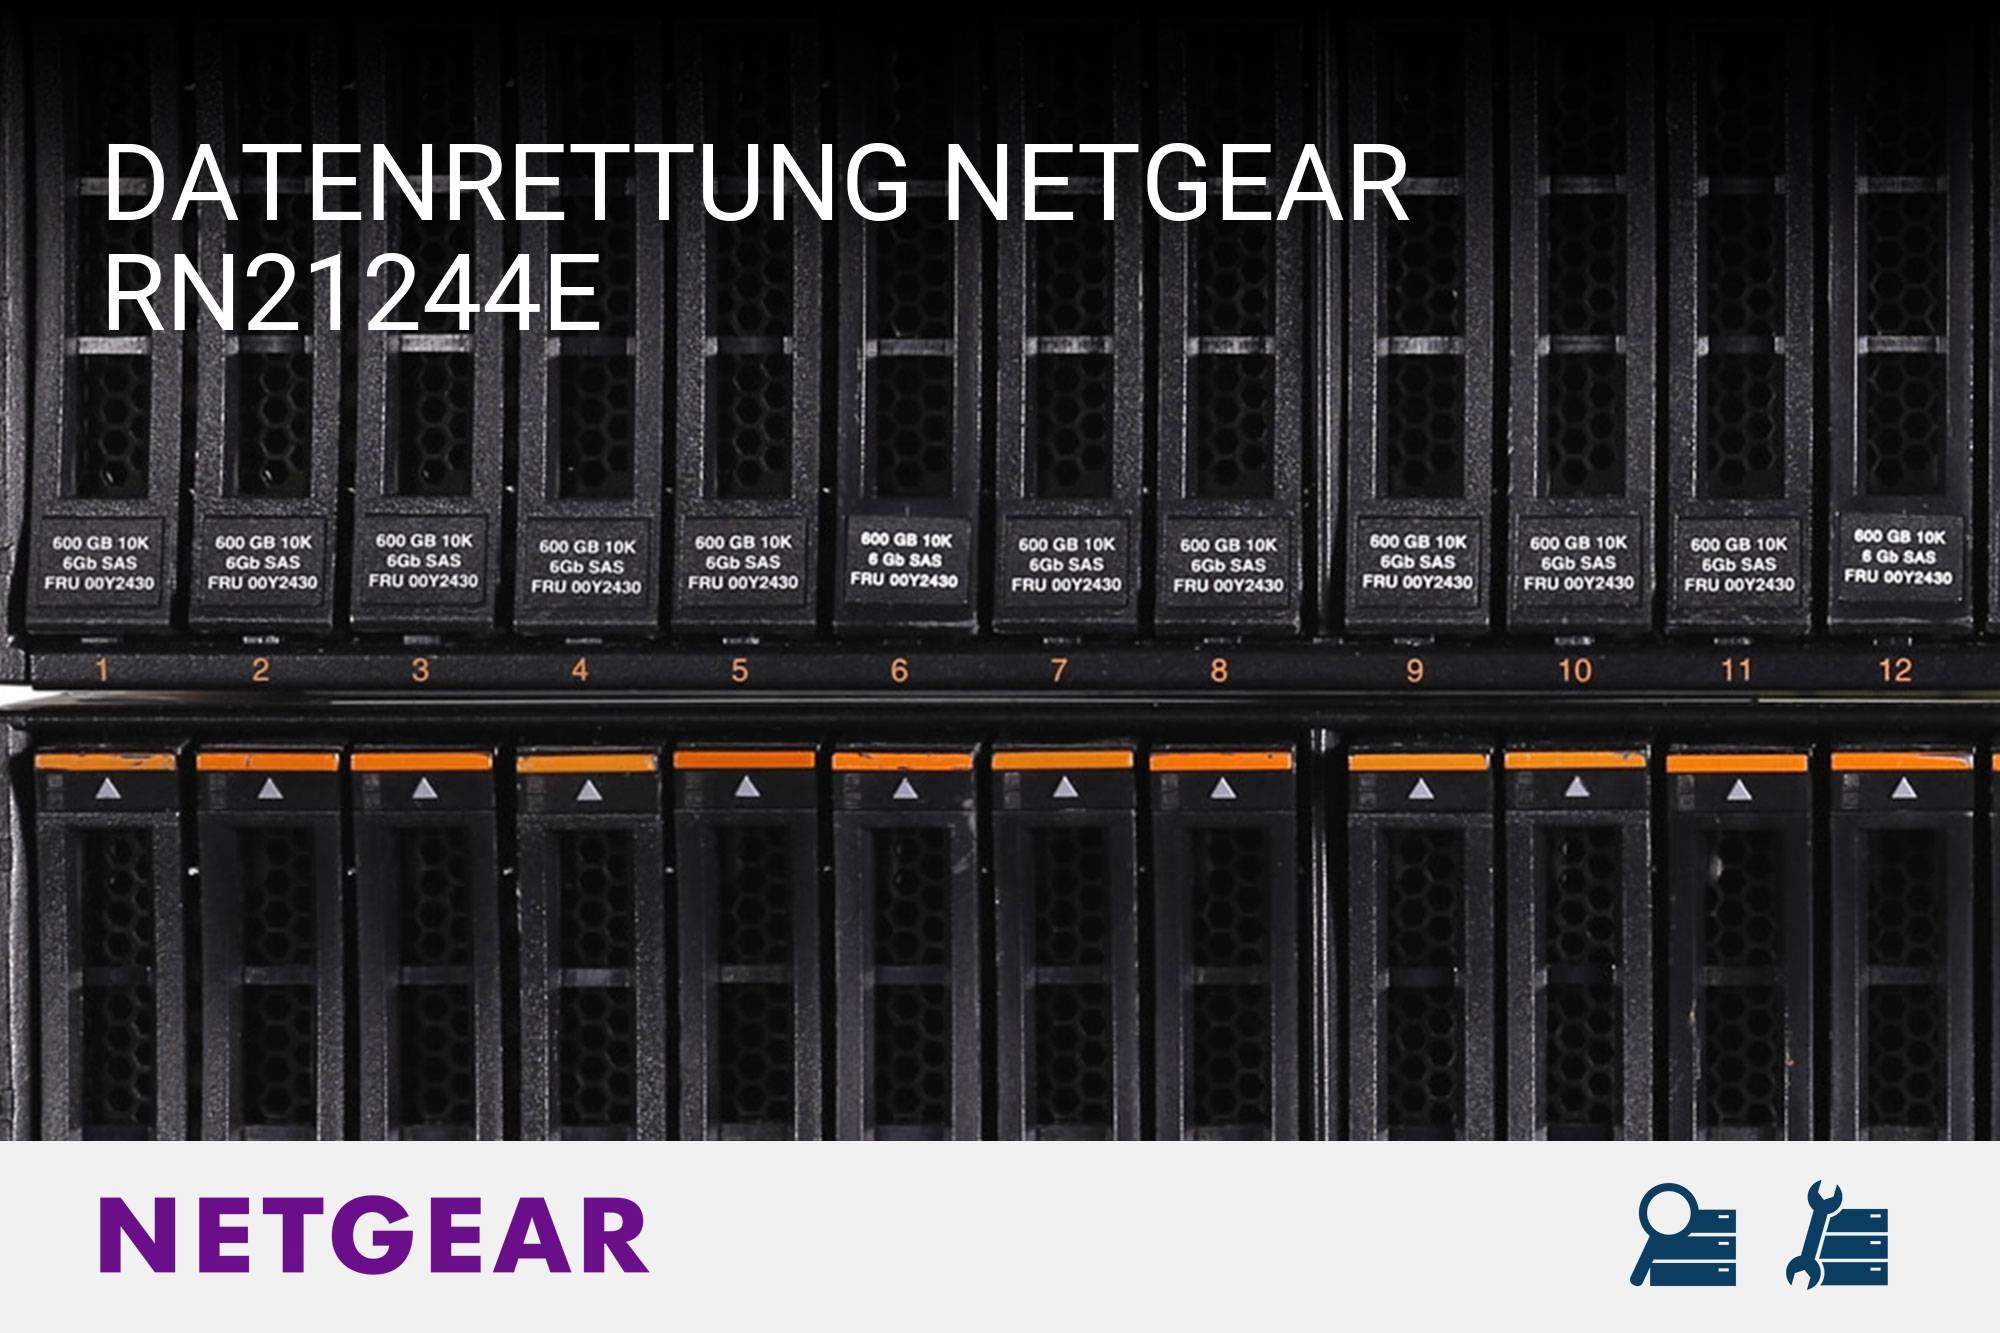 Netgear RN21244E